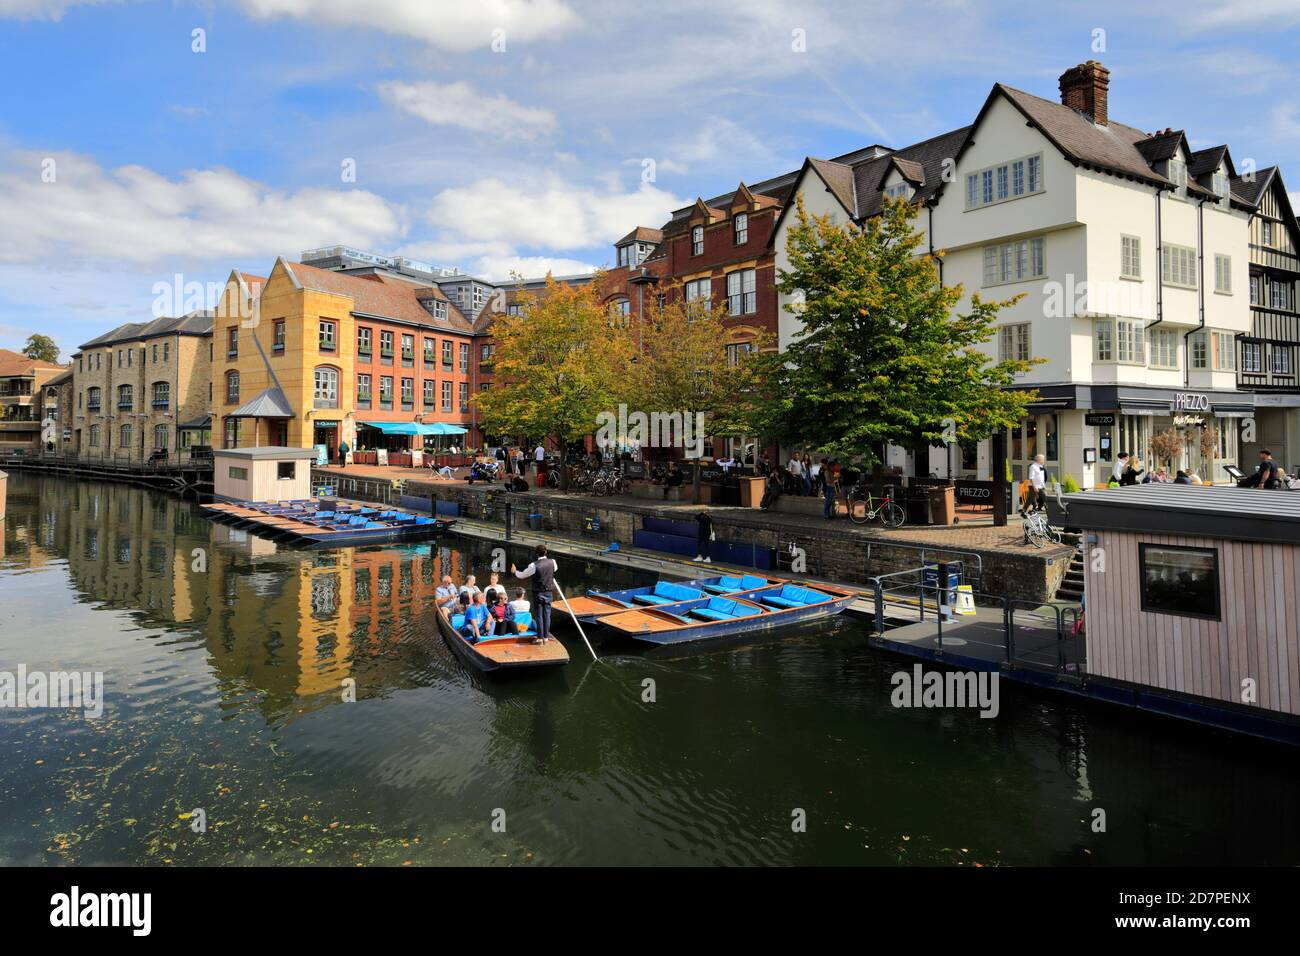 Punts on the river Cam, from the Magdalene Bridge, Cambridge City, Cambridgeshire, England, UK Stock Photo